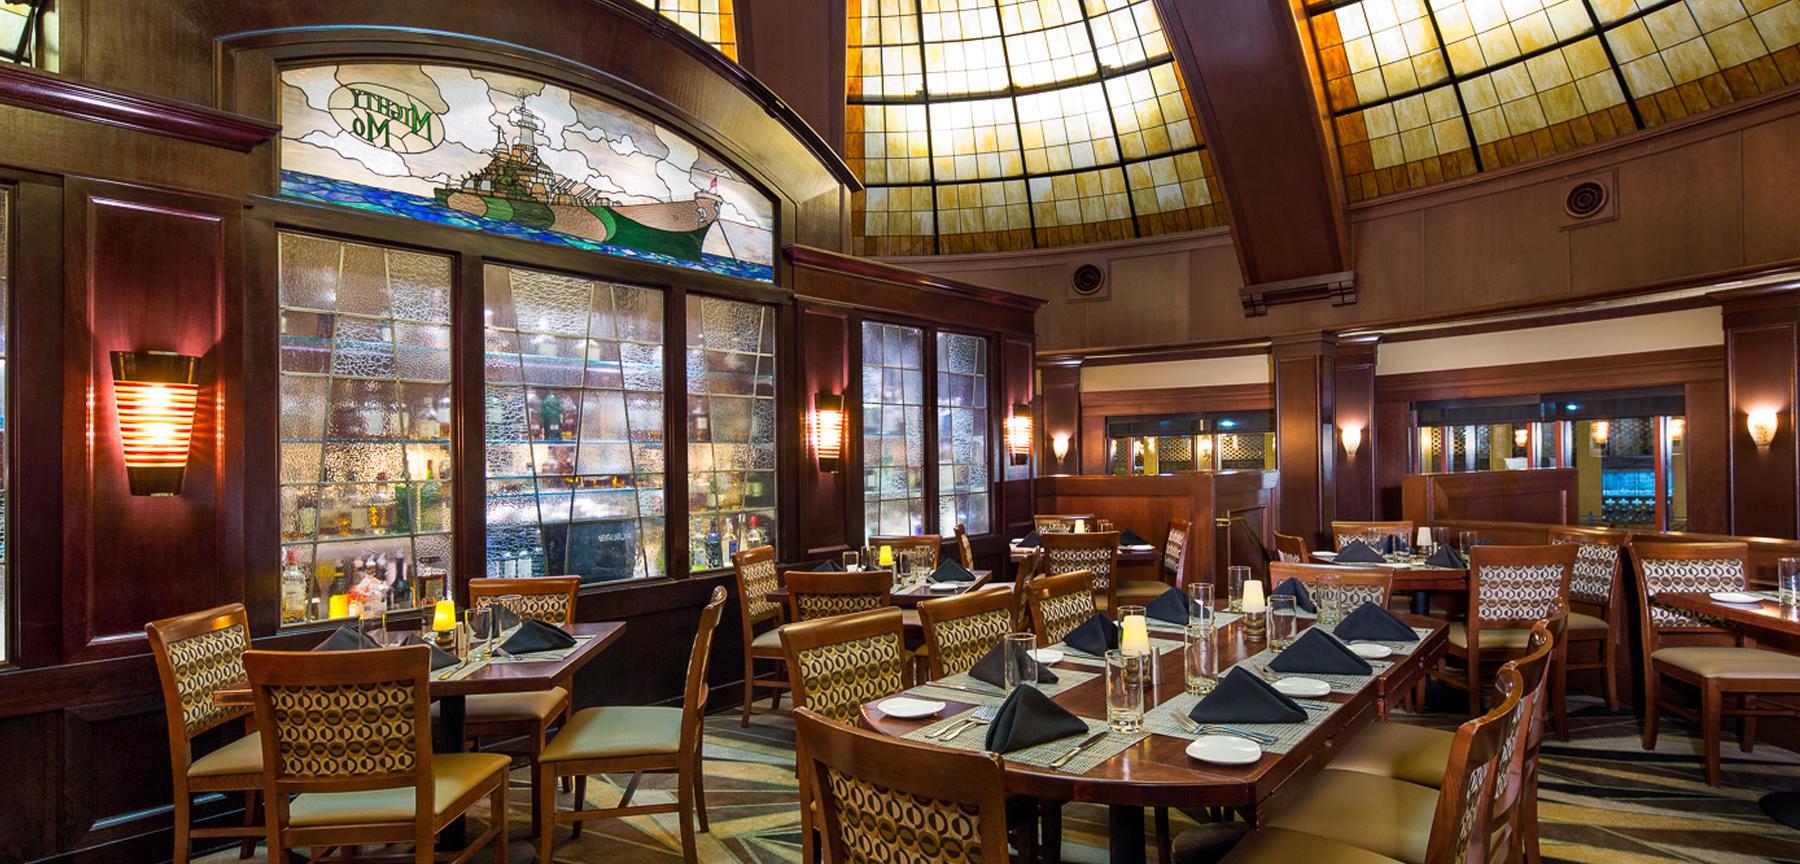 McCormick & Schmick's restaurant in Kansas City, MO - dining area